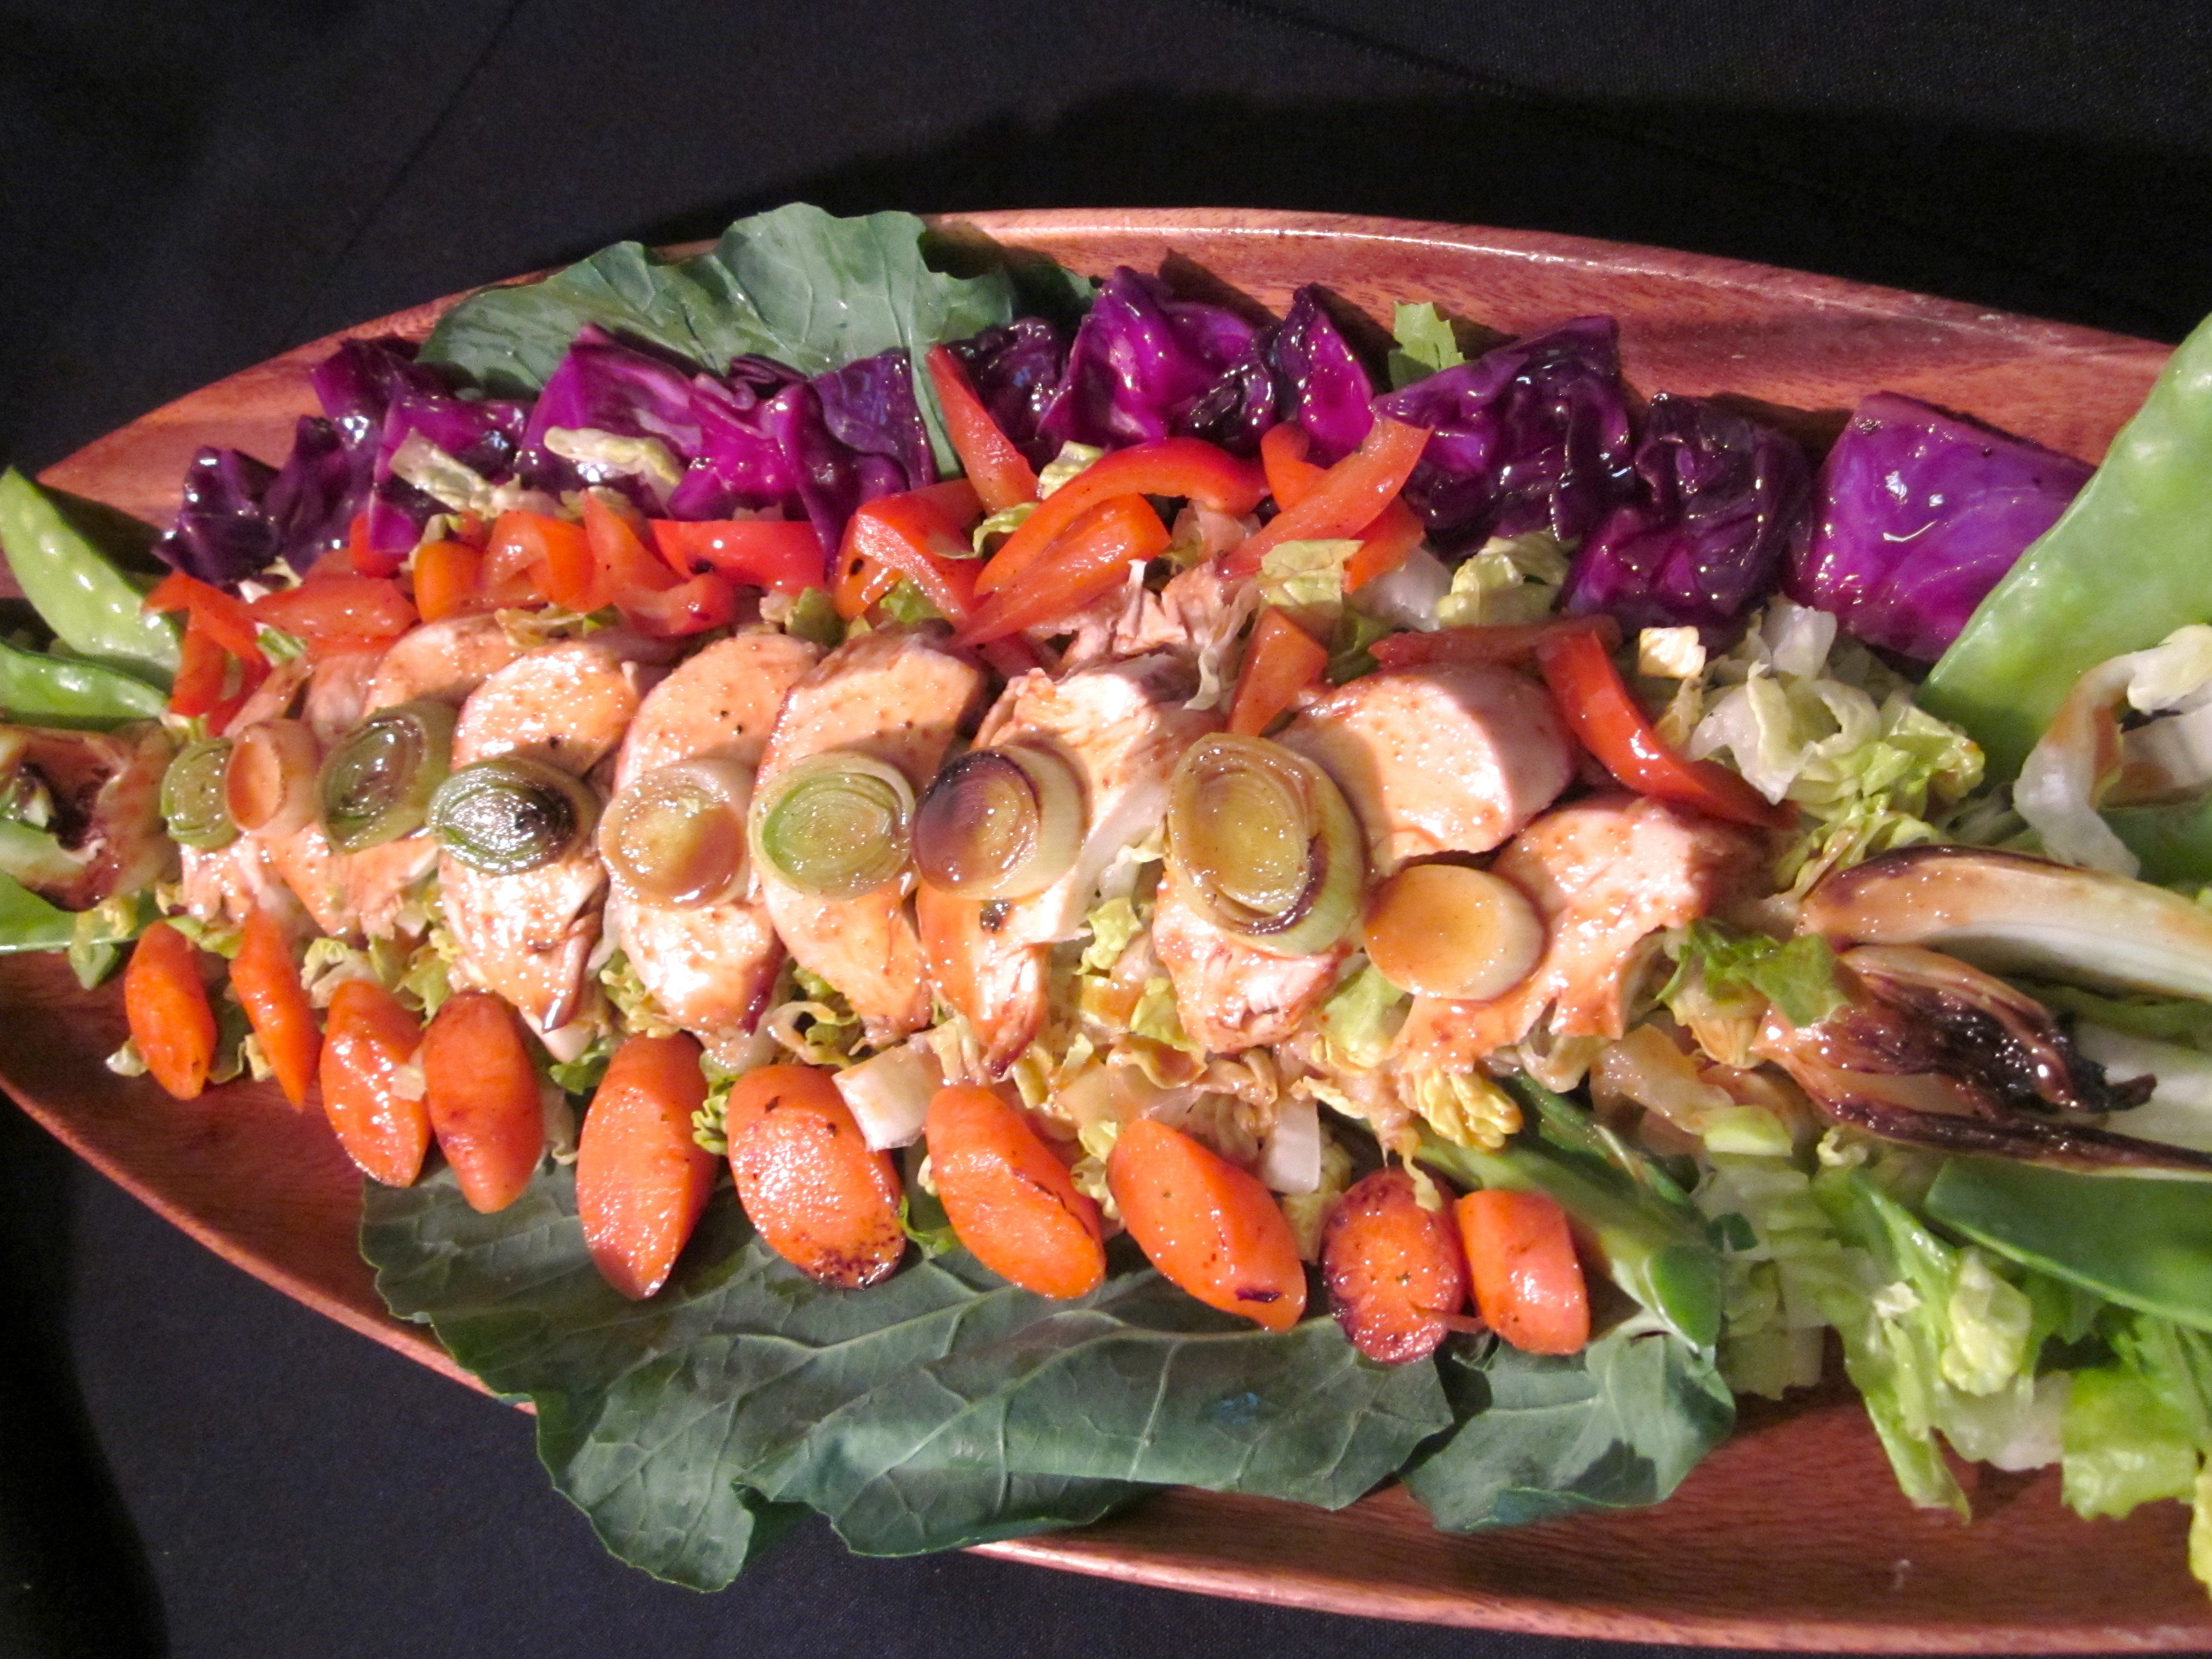 Chicken, Romaine & Veggie Salad with Sassy Peanut-Sesame Sauce